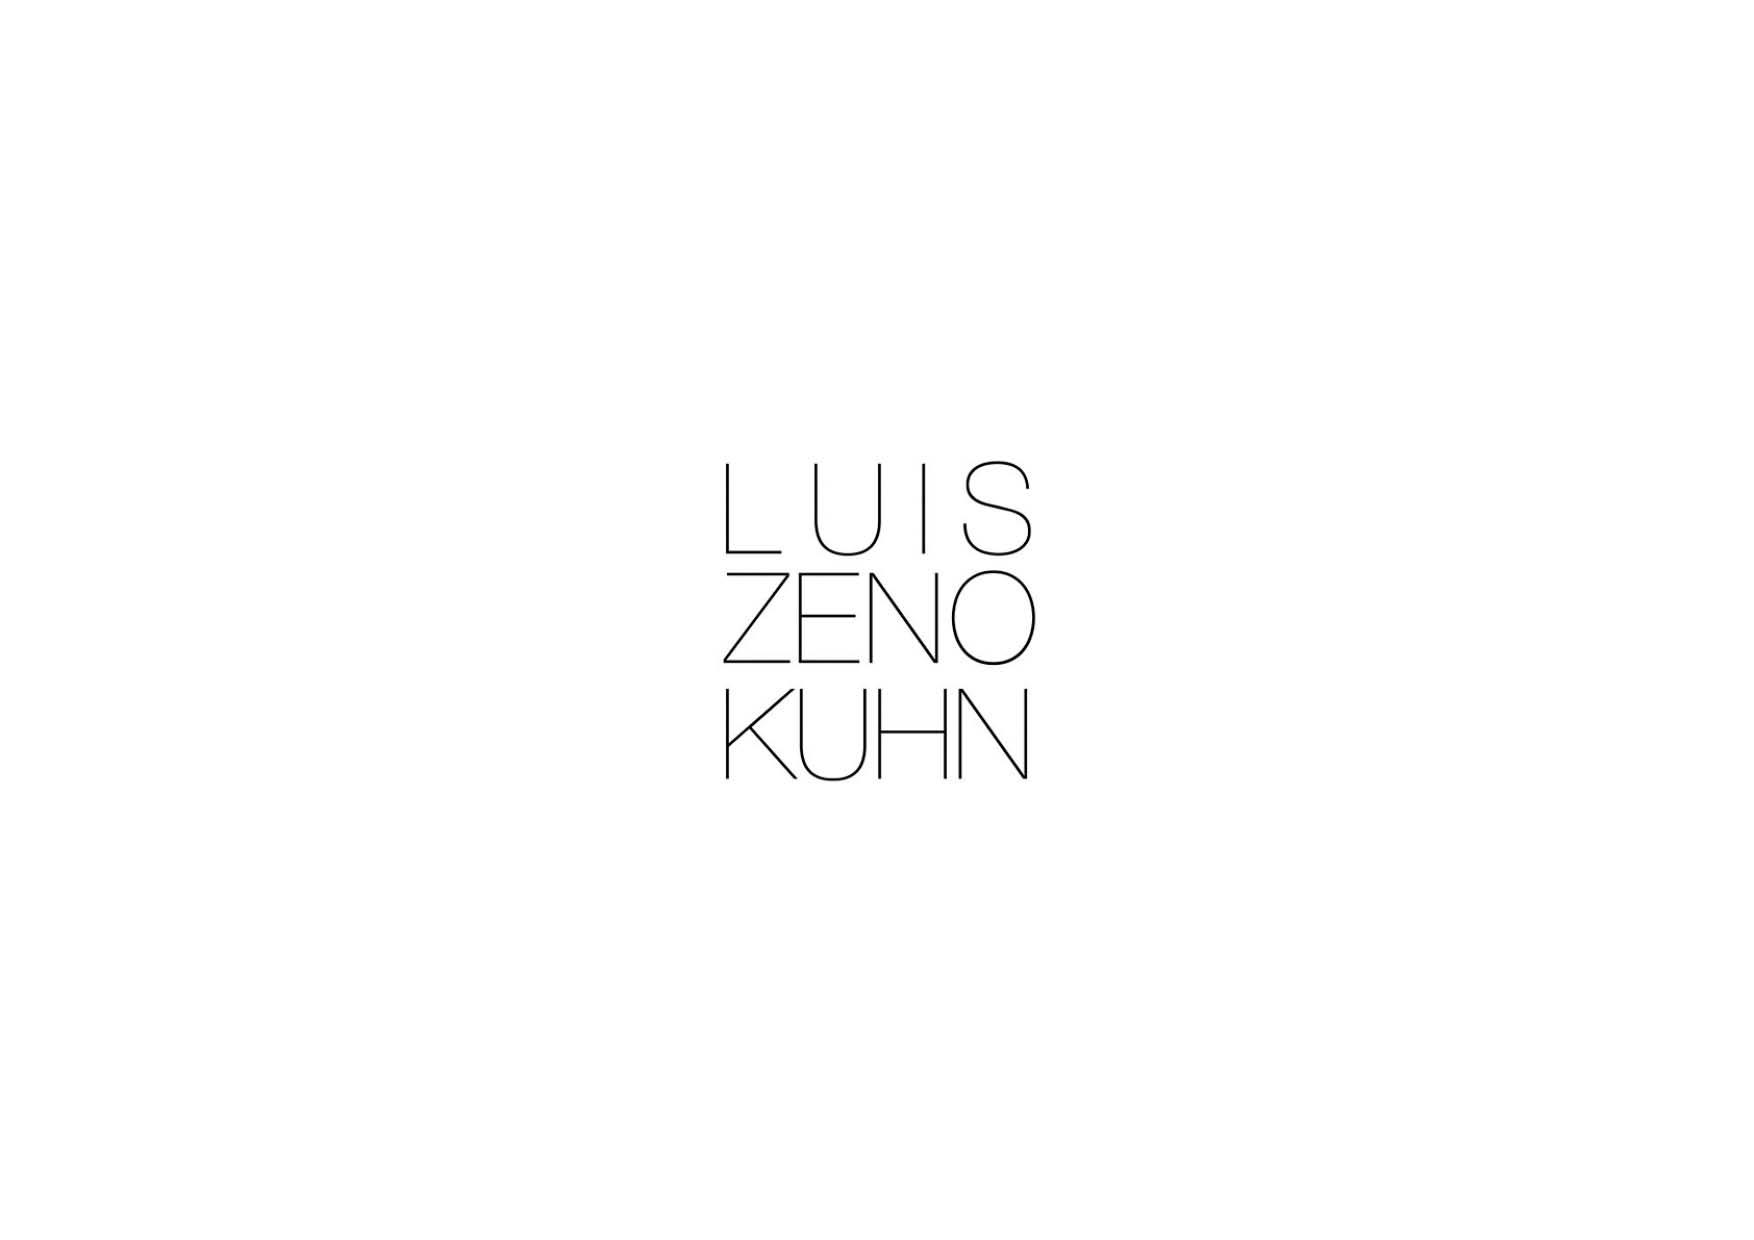 LUIS ZENO KUHN